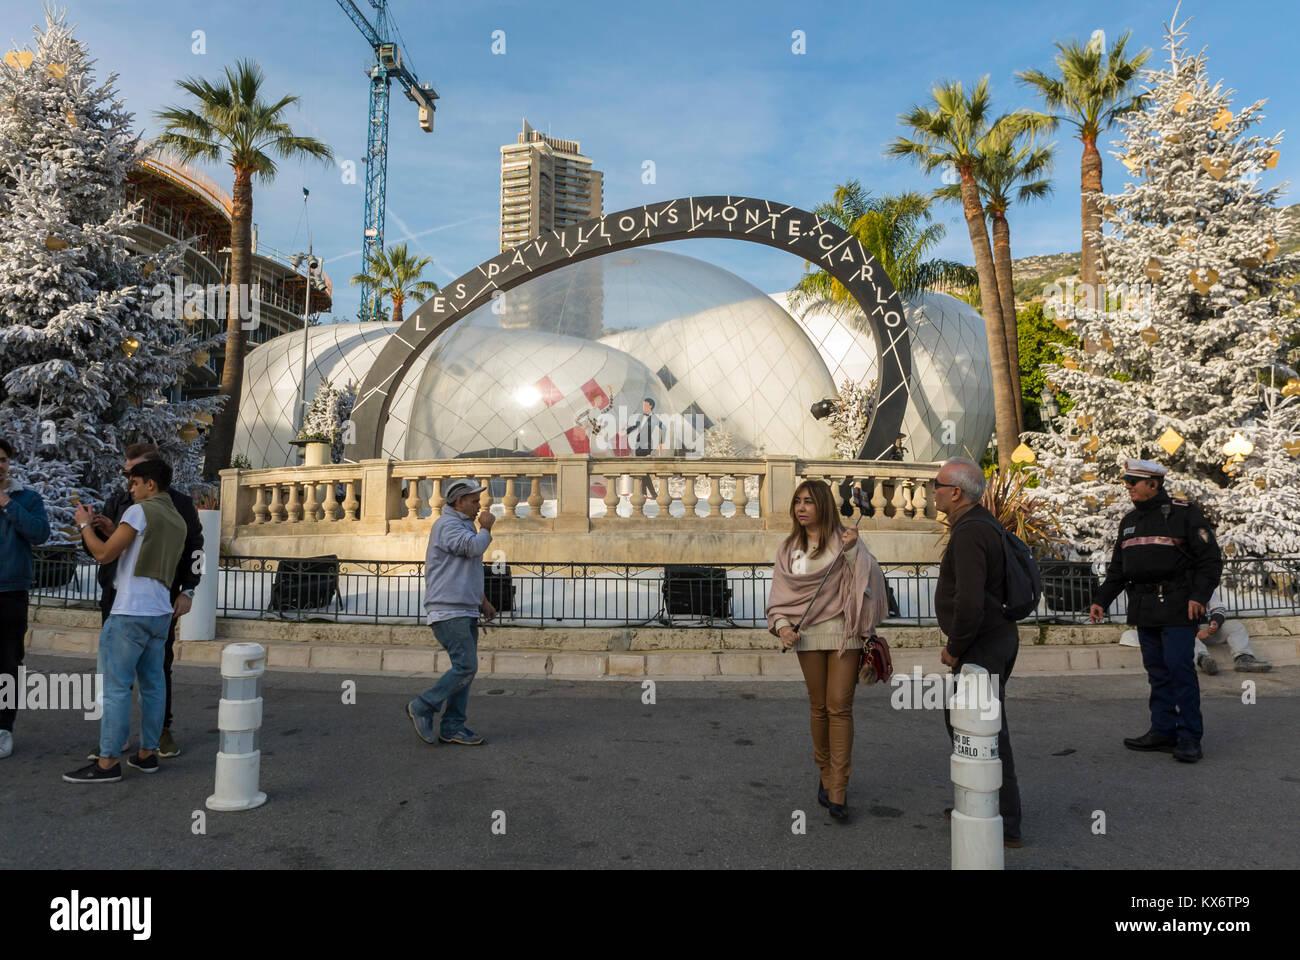 Monaco, Monte Carlo, Les Pavillions, Luxury Shops, Shopping Center, Chinese Tourists on Street - Stock Image